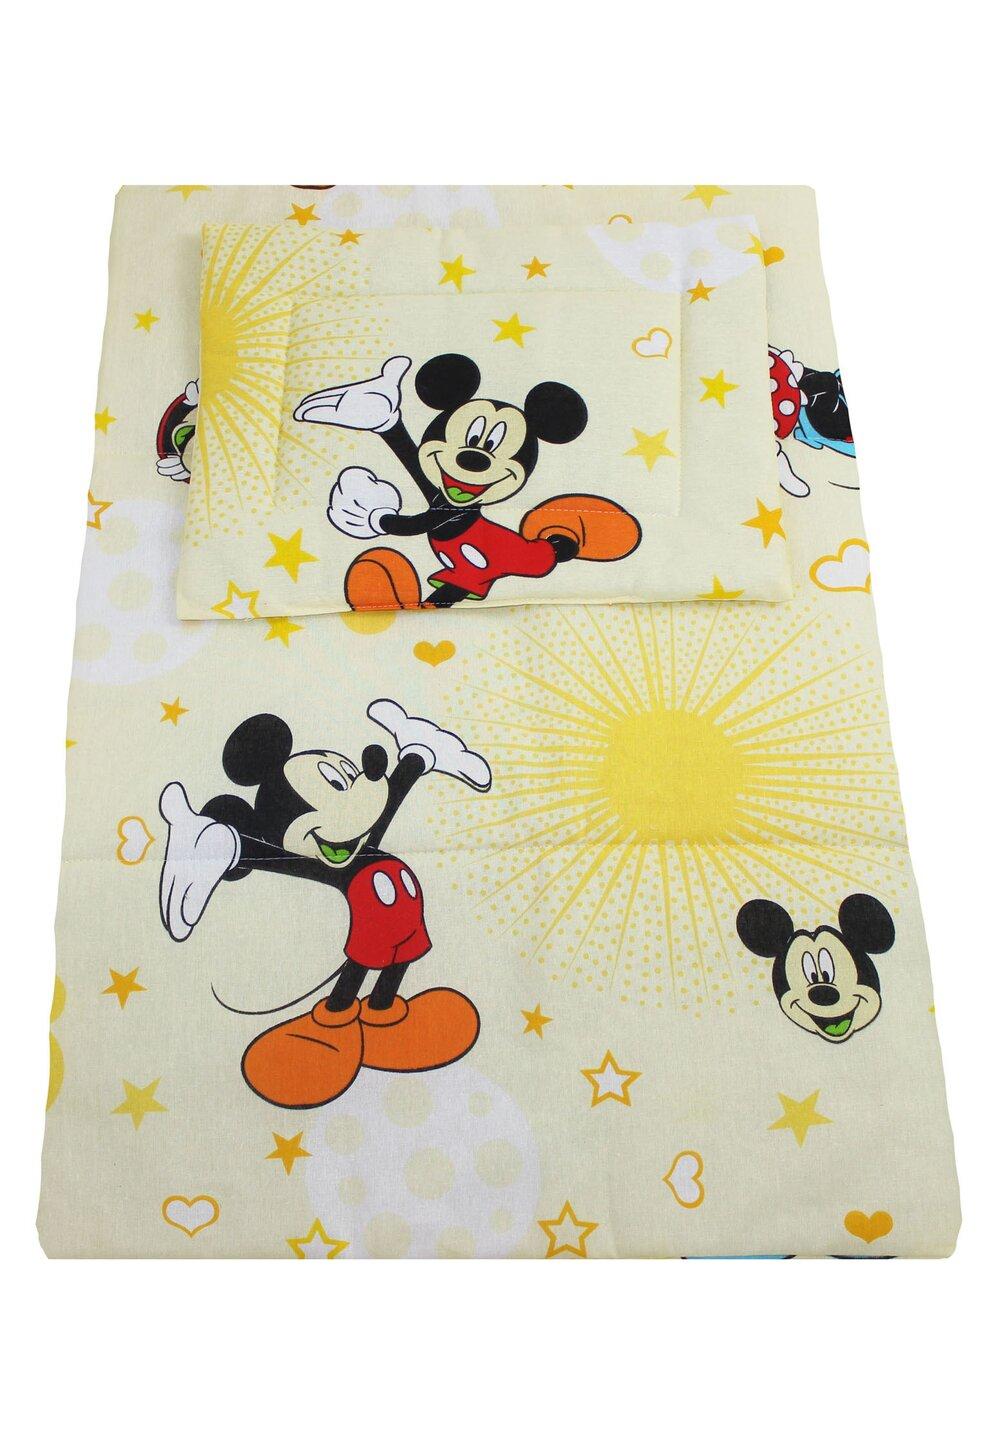 Lenjerie 3 piese, Minnie si Mickey, galben, 120x60cm imagine